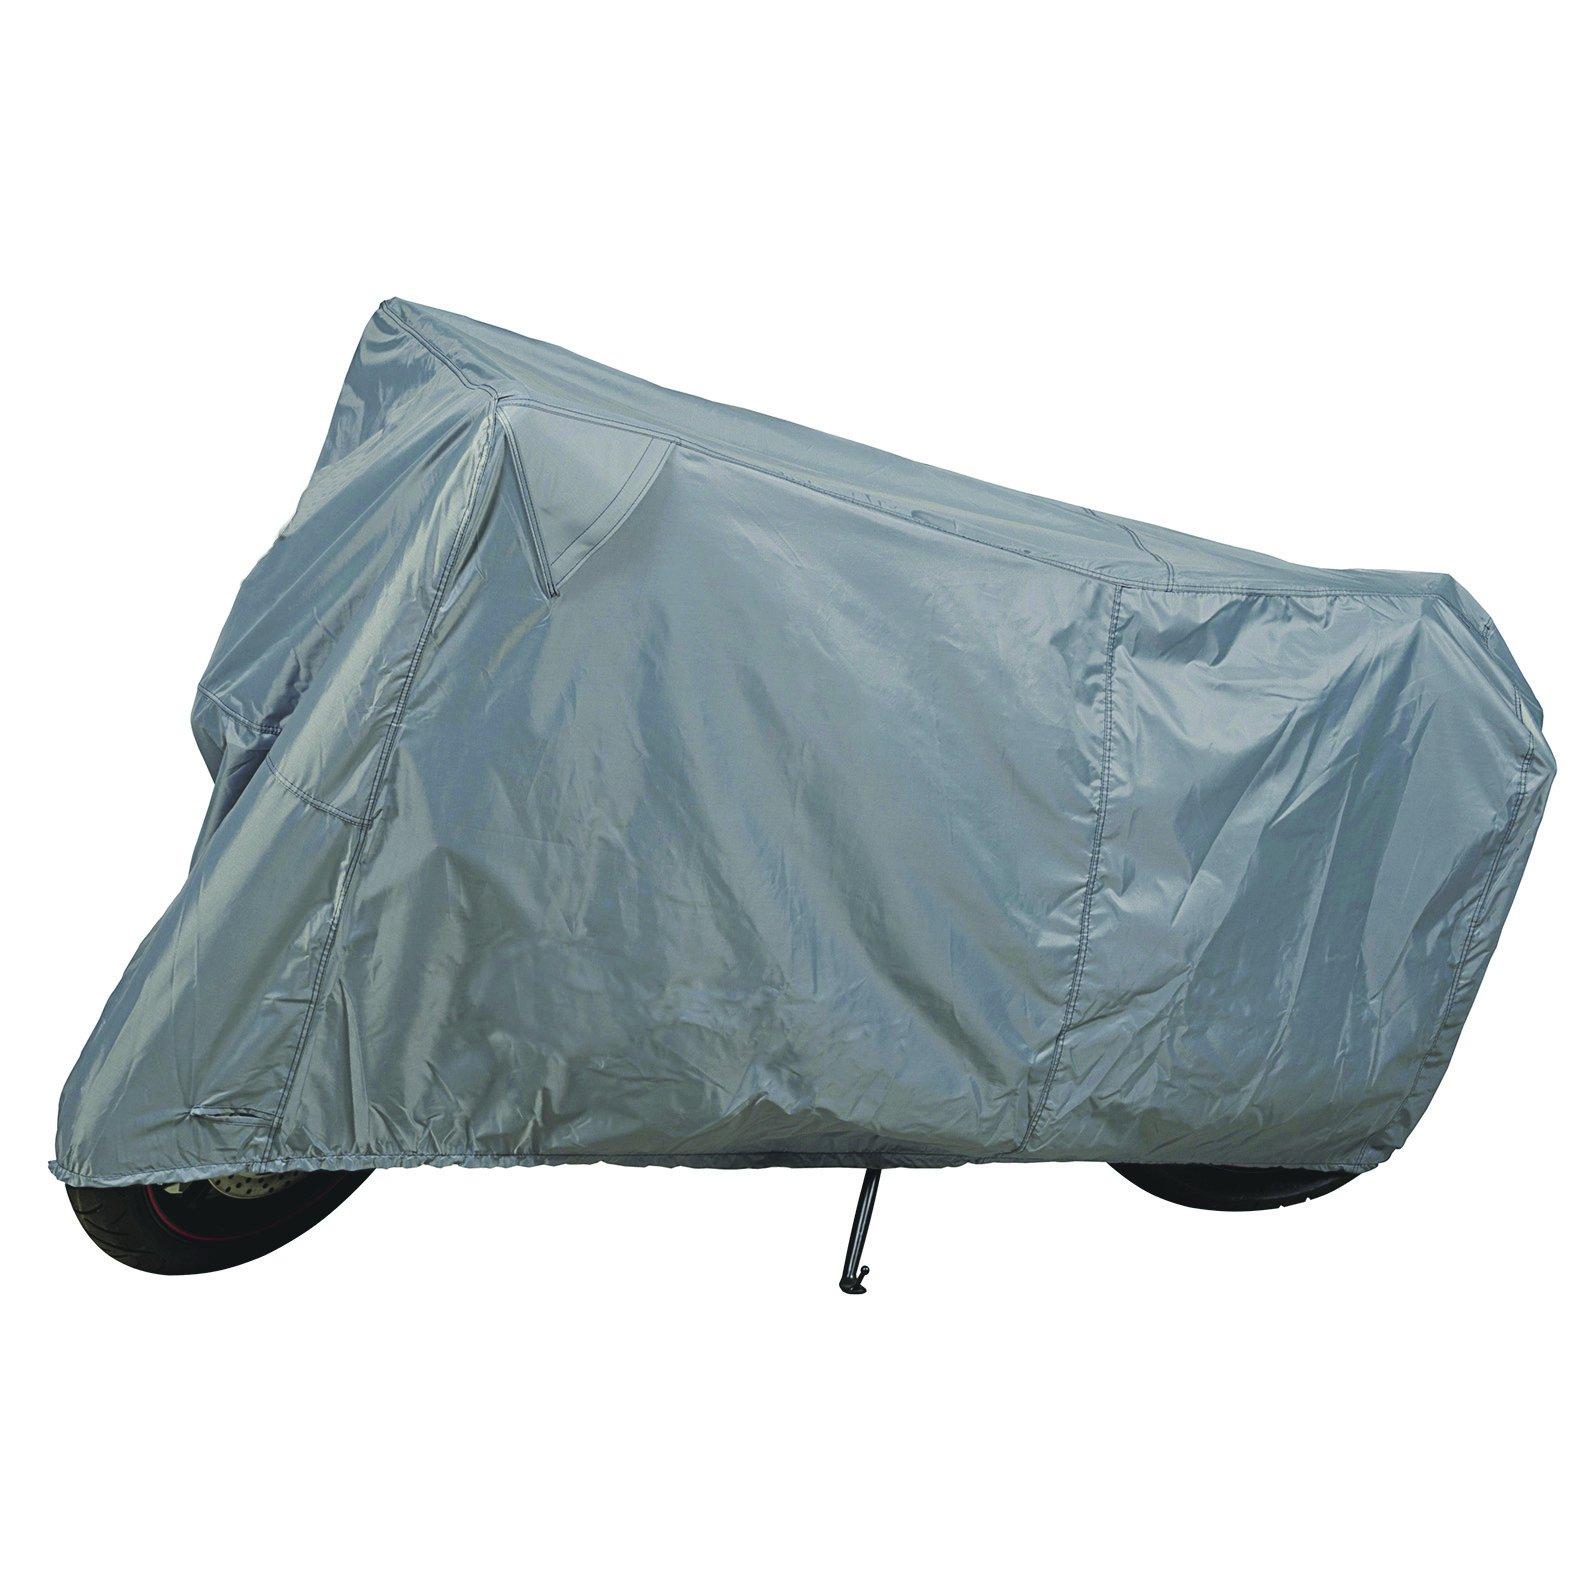 Guardian by Dowco 50007-00 WeatherAll Waterproof Indoor/Outdoor Motorcycle Cover: Grey, Sport